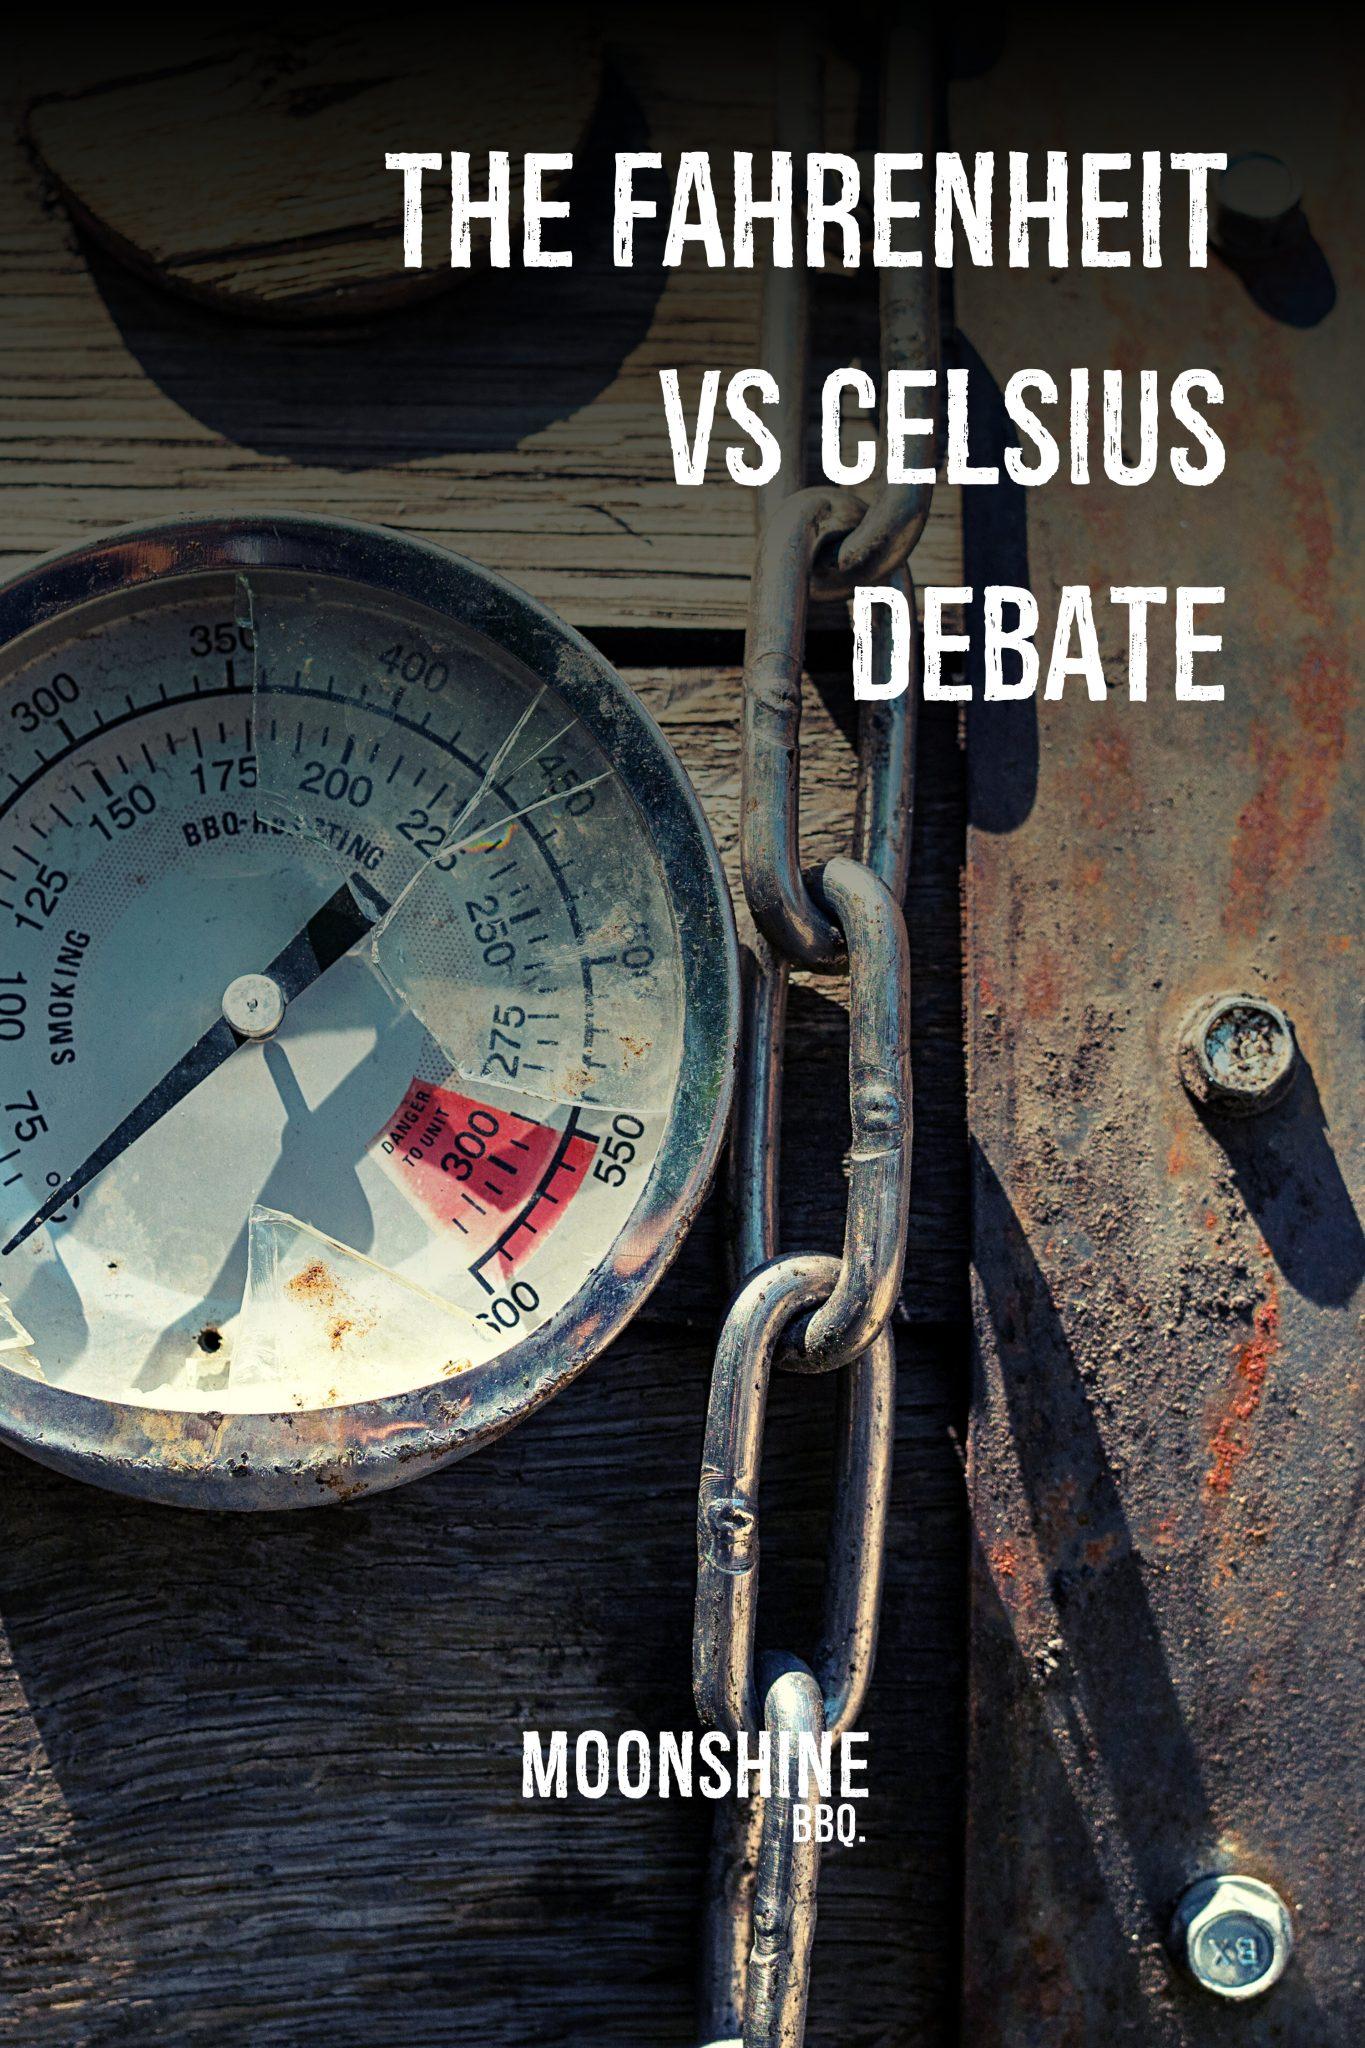 The Great BBQ Debate - Fahrenheit or Celsius?